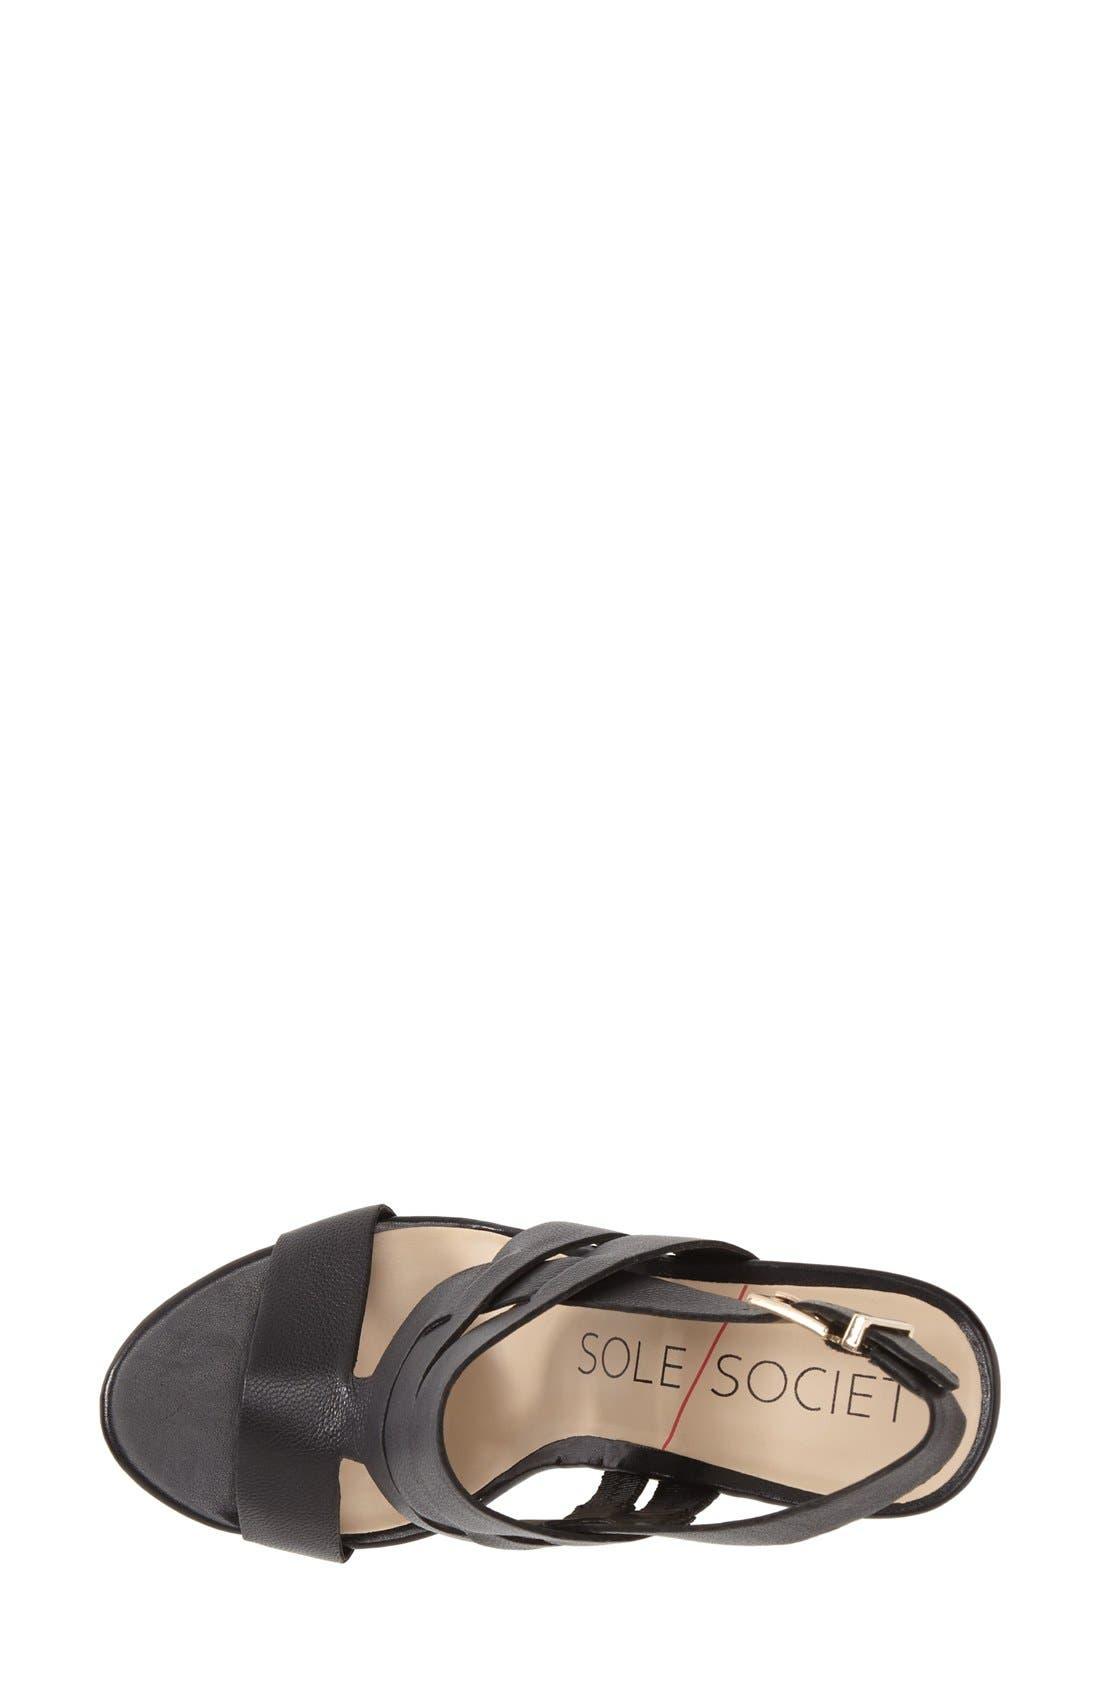 SOLE SOCIETY,                             'Jenny' Slingback Wedge Sandal,                             Alternate thumbnail 4, color,                             001